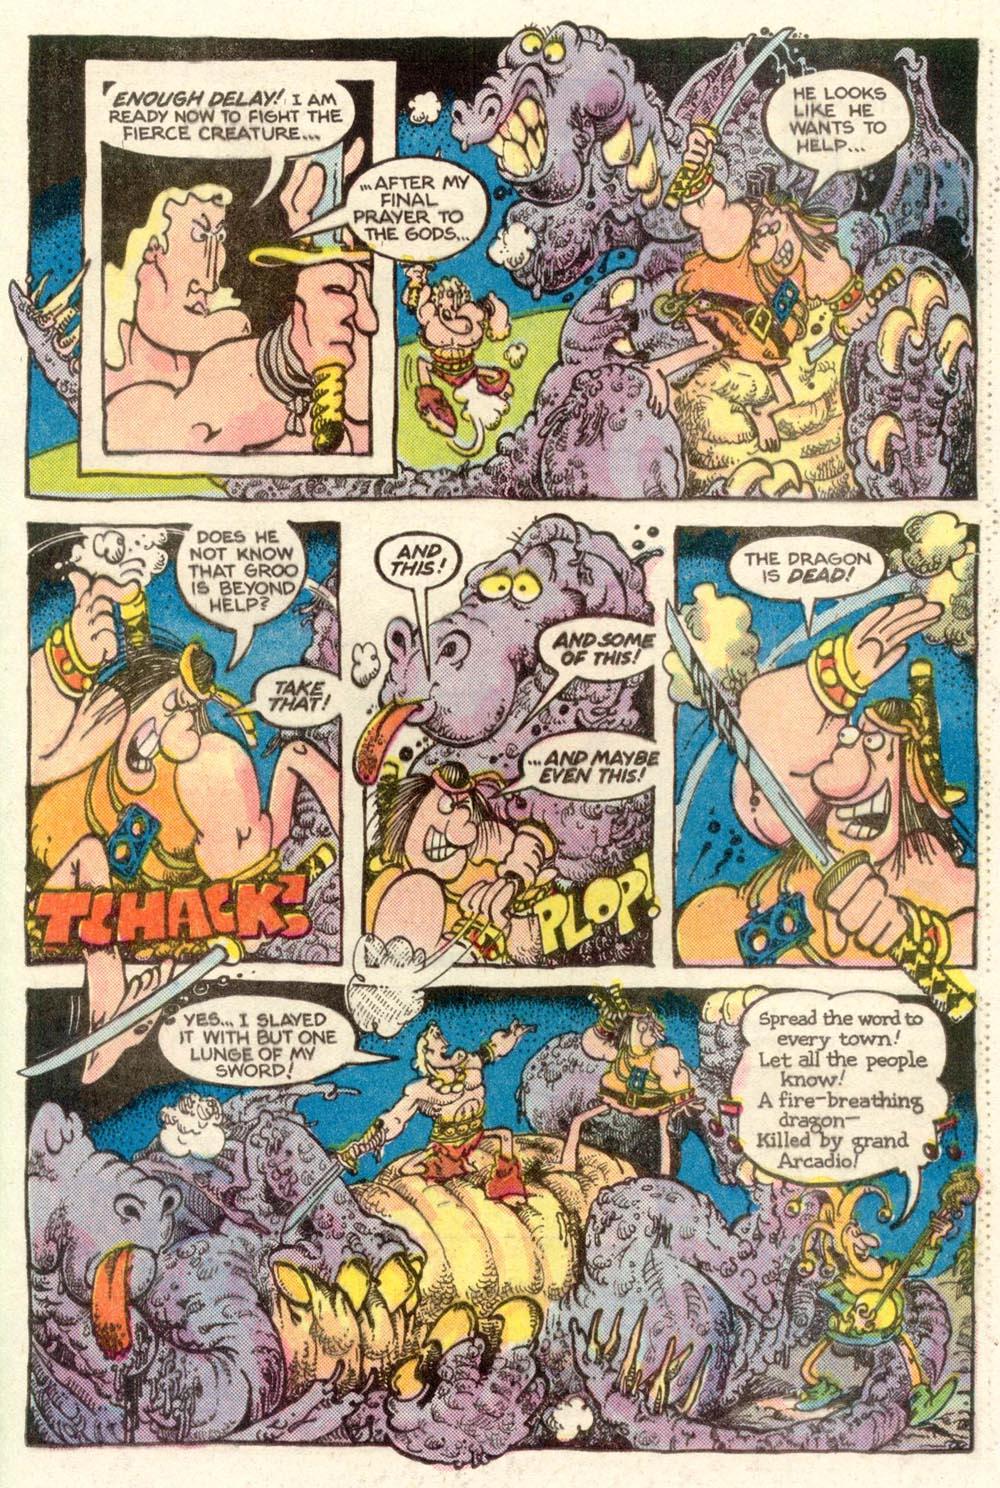 Read online Sergio Aragonés Groo the Wanderer comic -  Issue #10 - 15